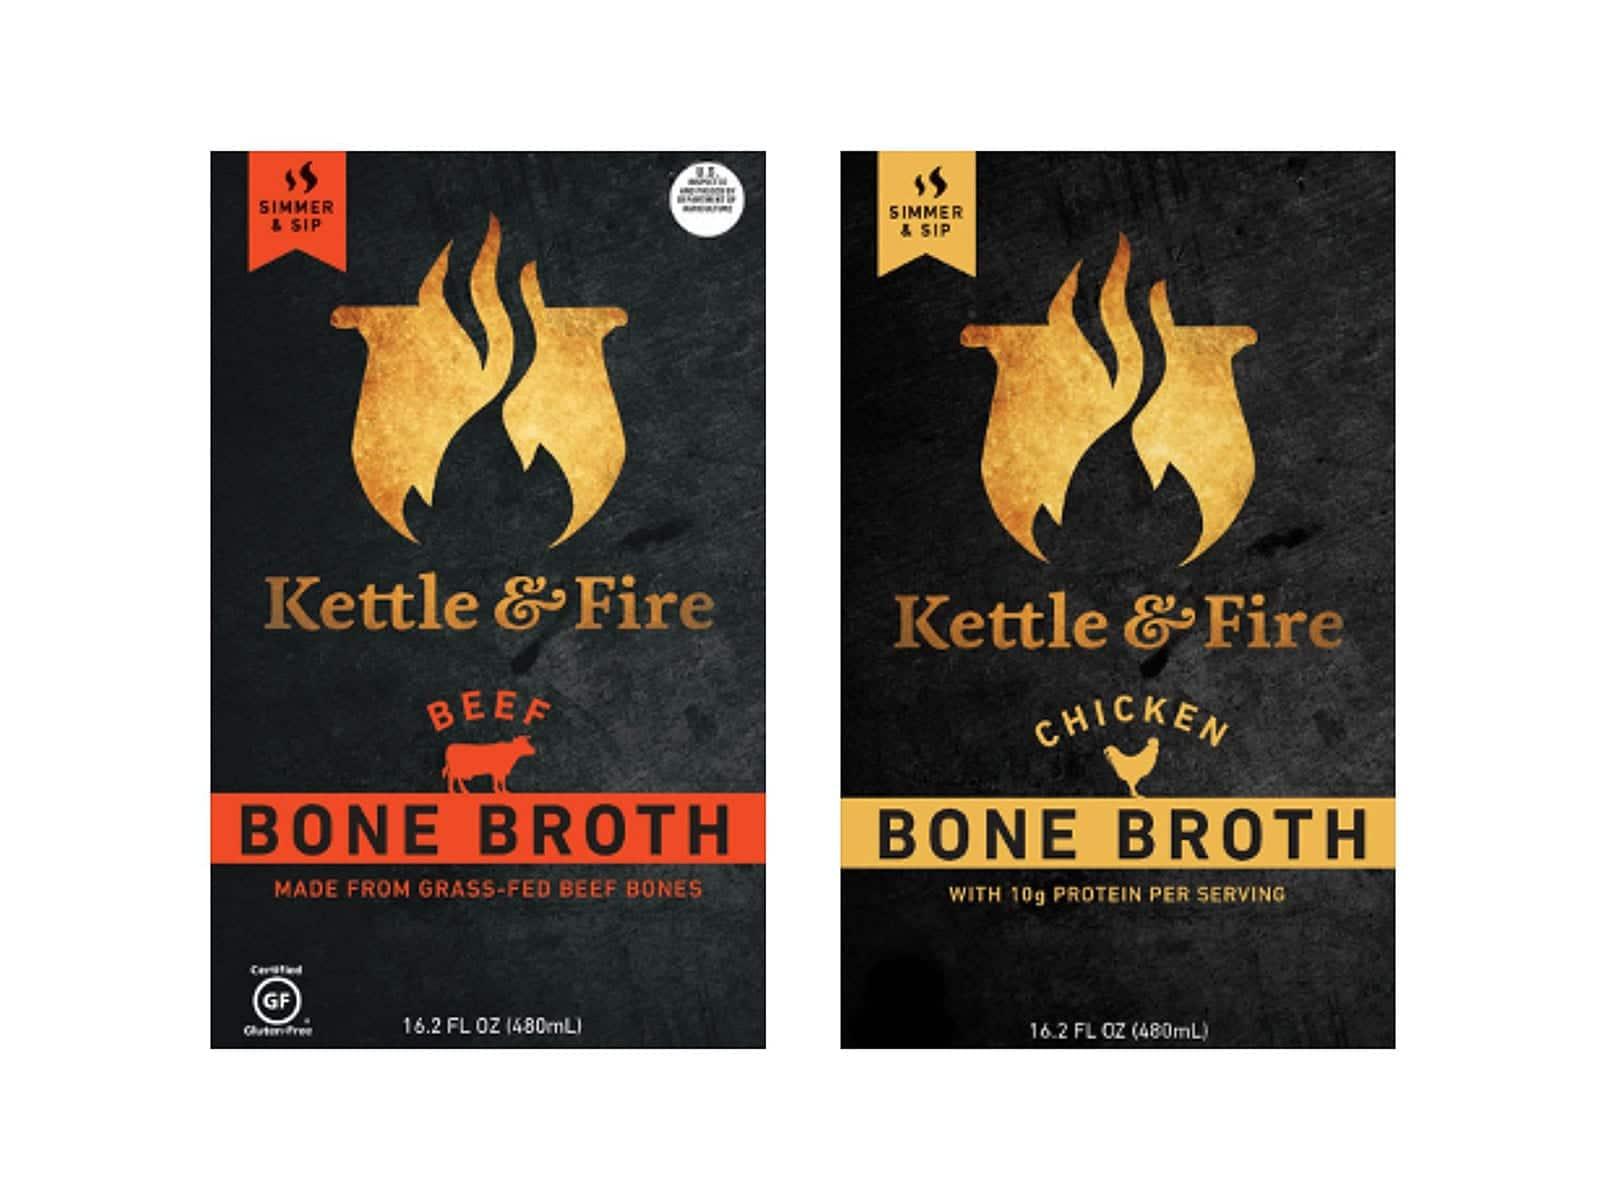 Kettle & Fire Bone Broth